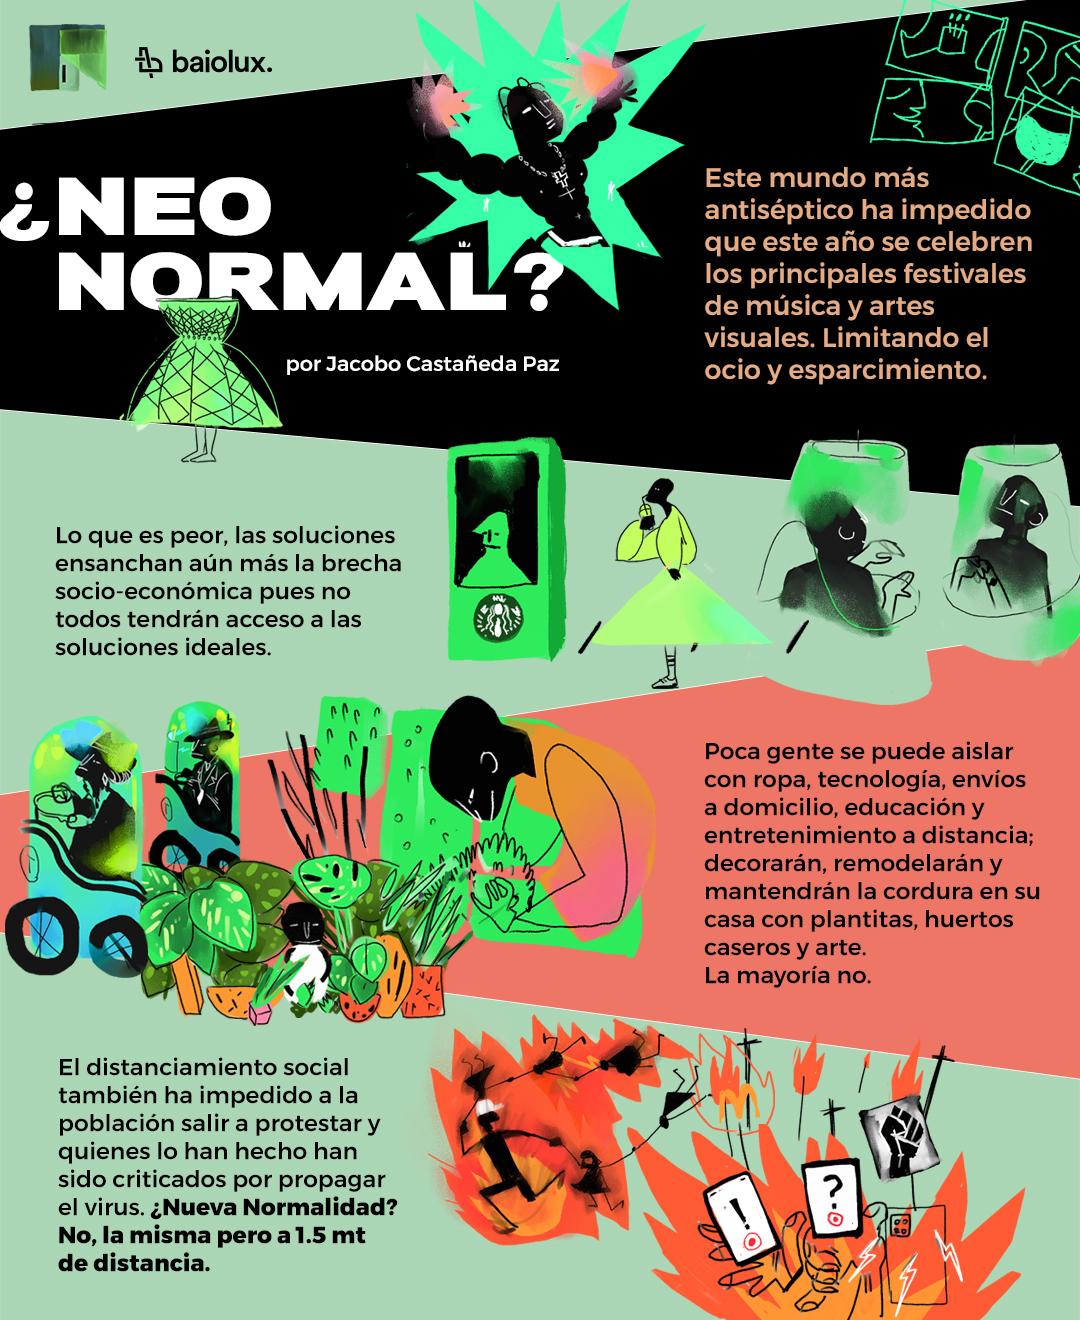 pictoline_neonormal_baiolux_postIG_002